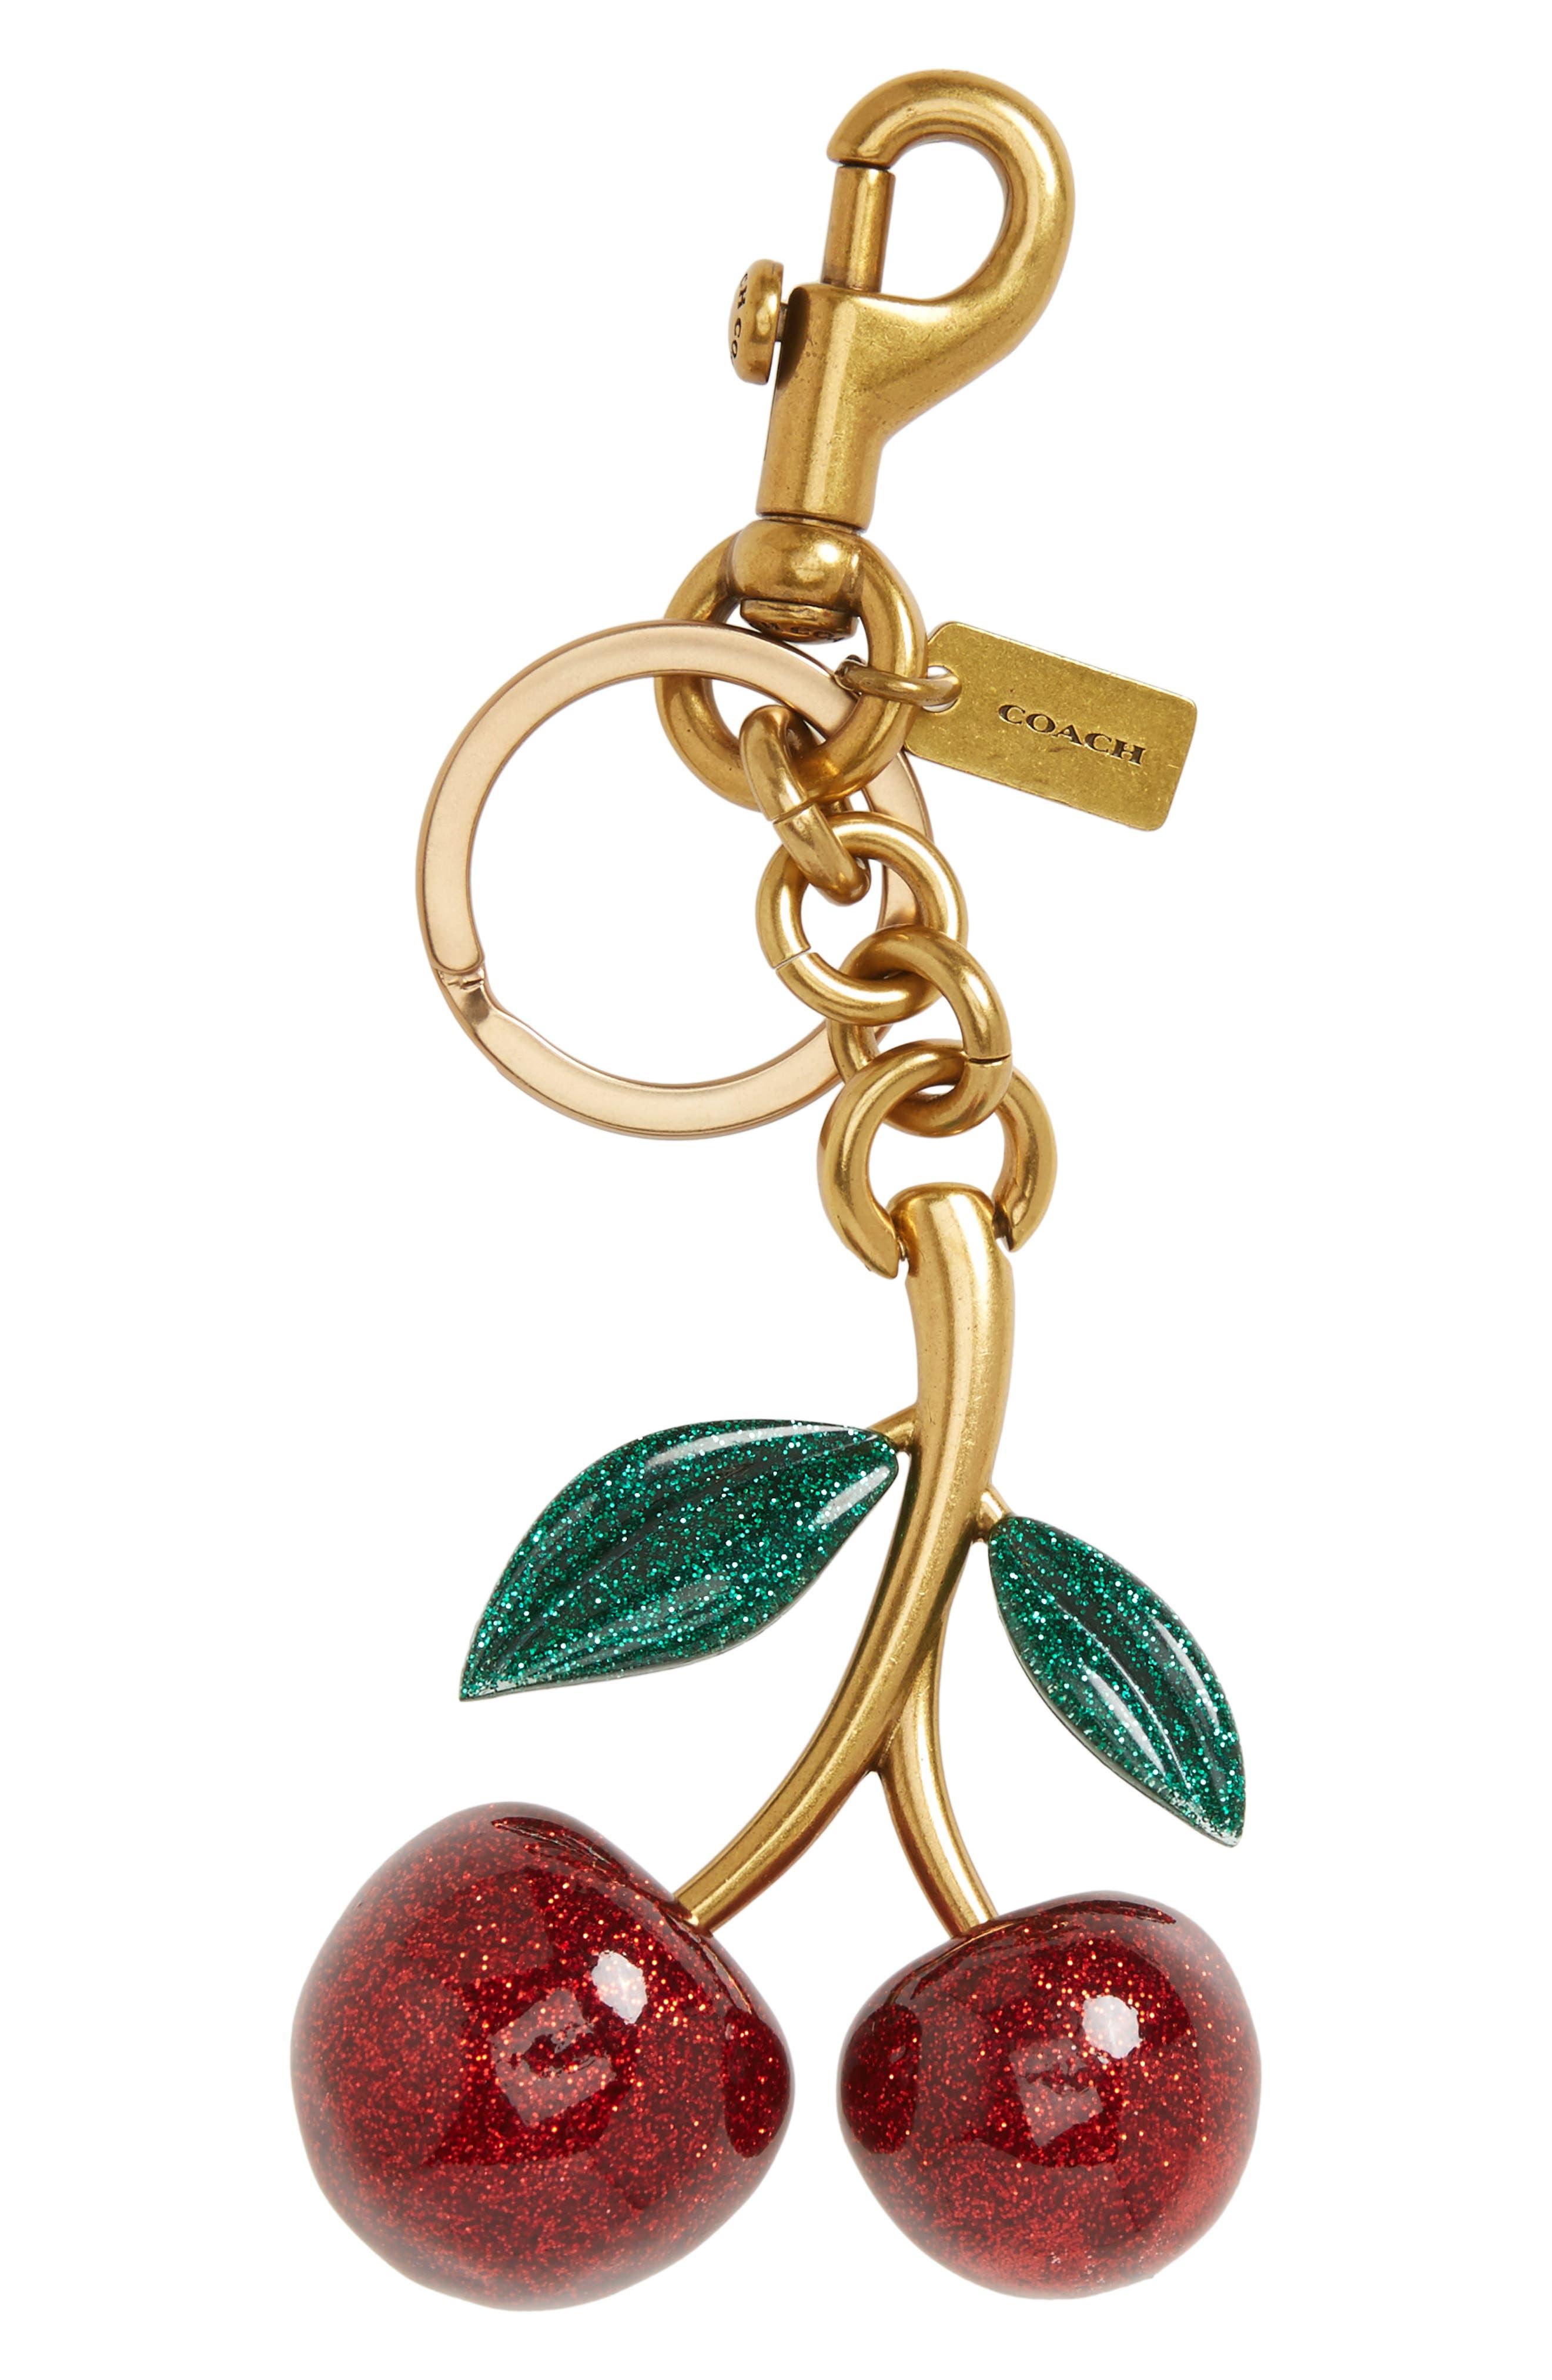 COACH 1941 Cherry Bag Charm